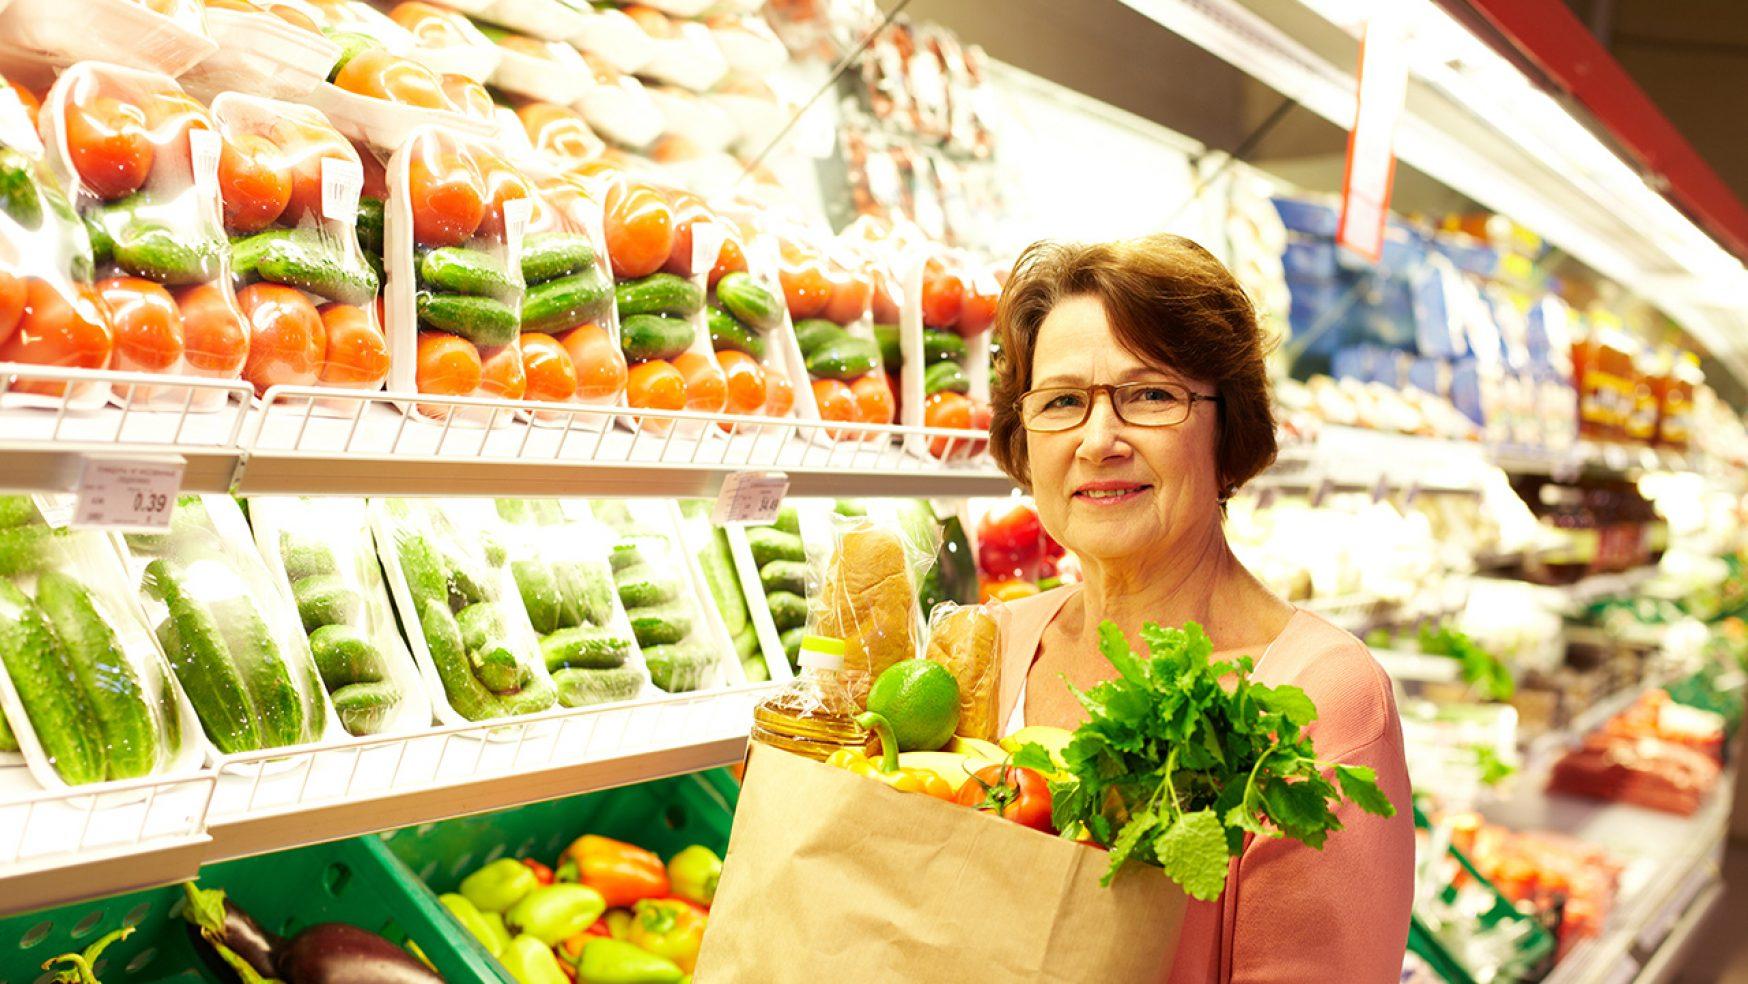 How to modify our lifestyle to prevent Diabetes?